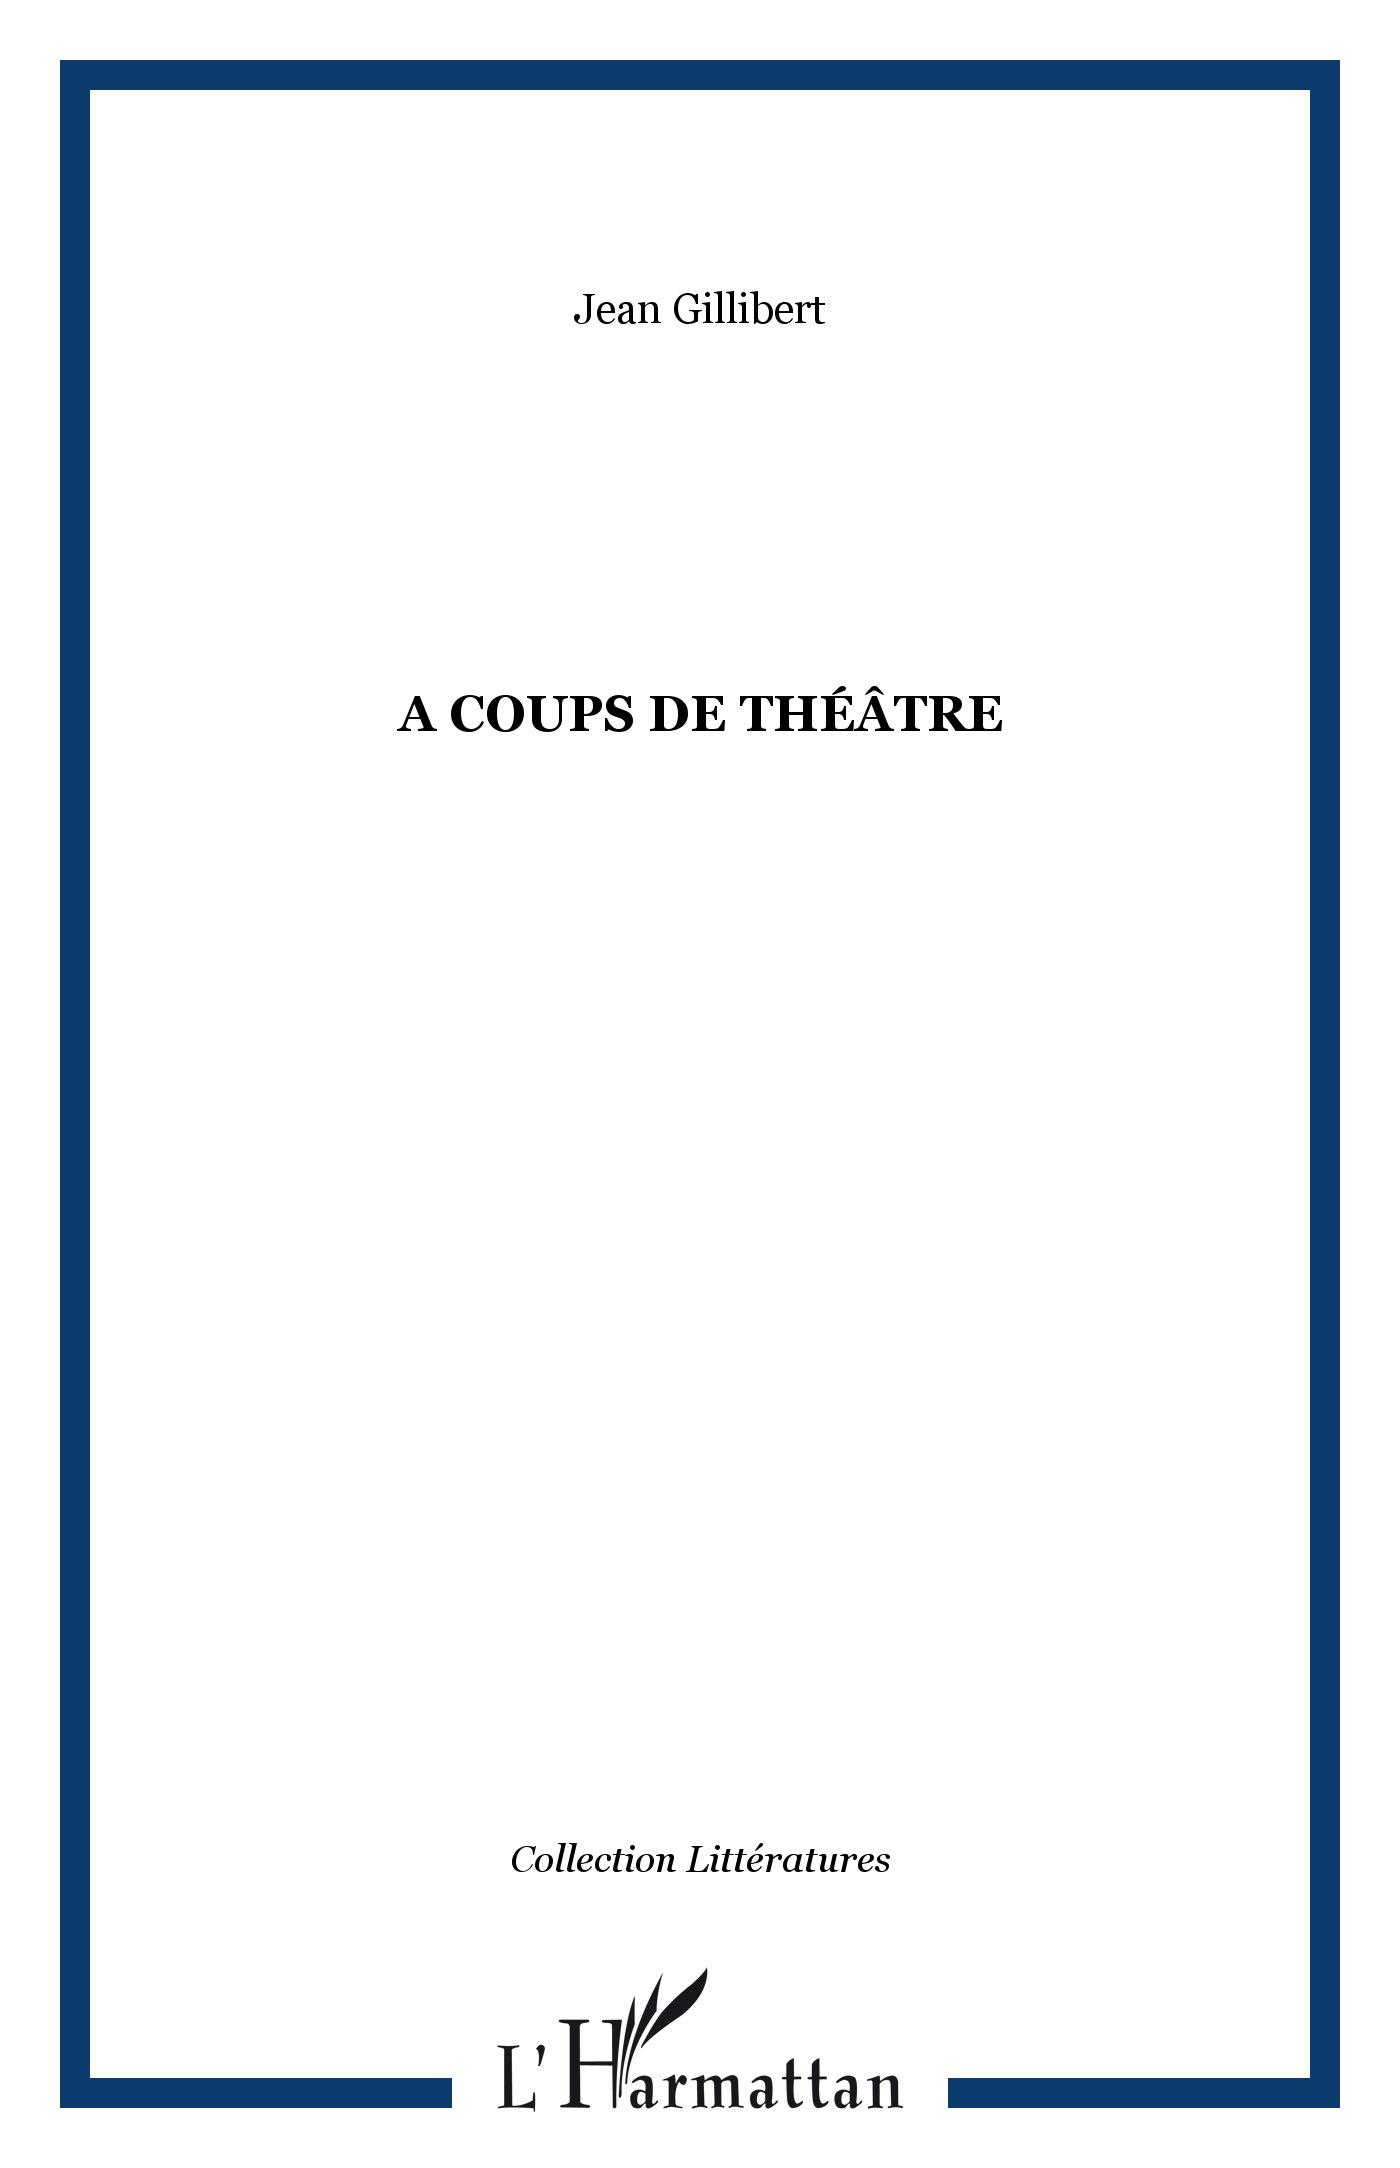 A COUPS DE THTRE Jean Gillibert